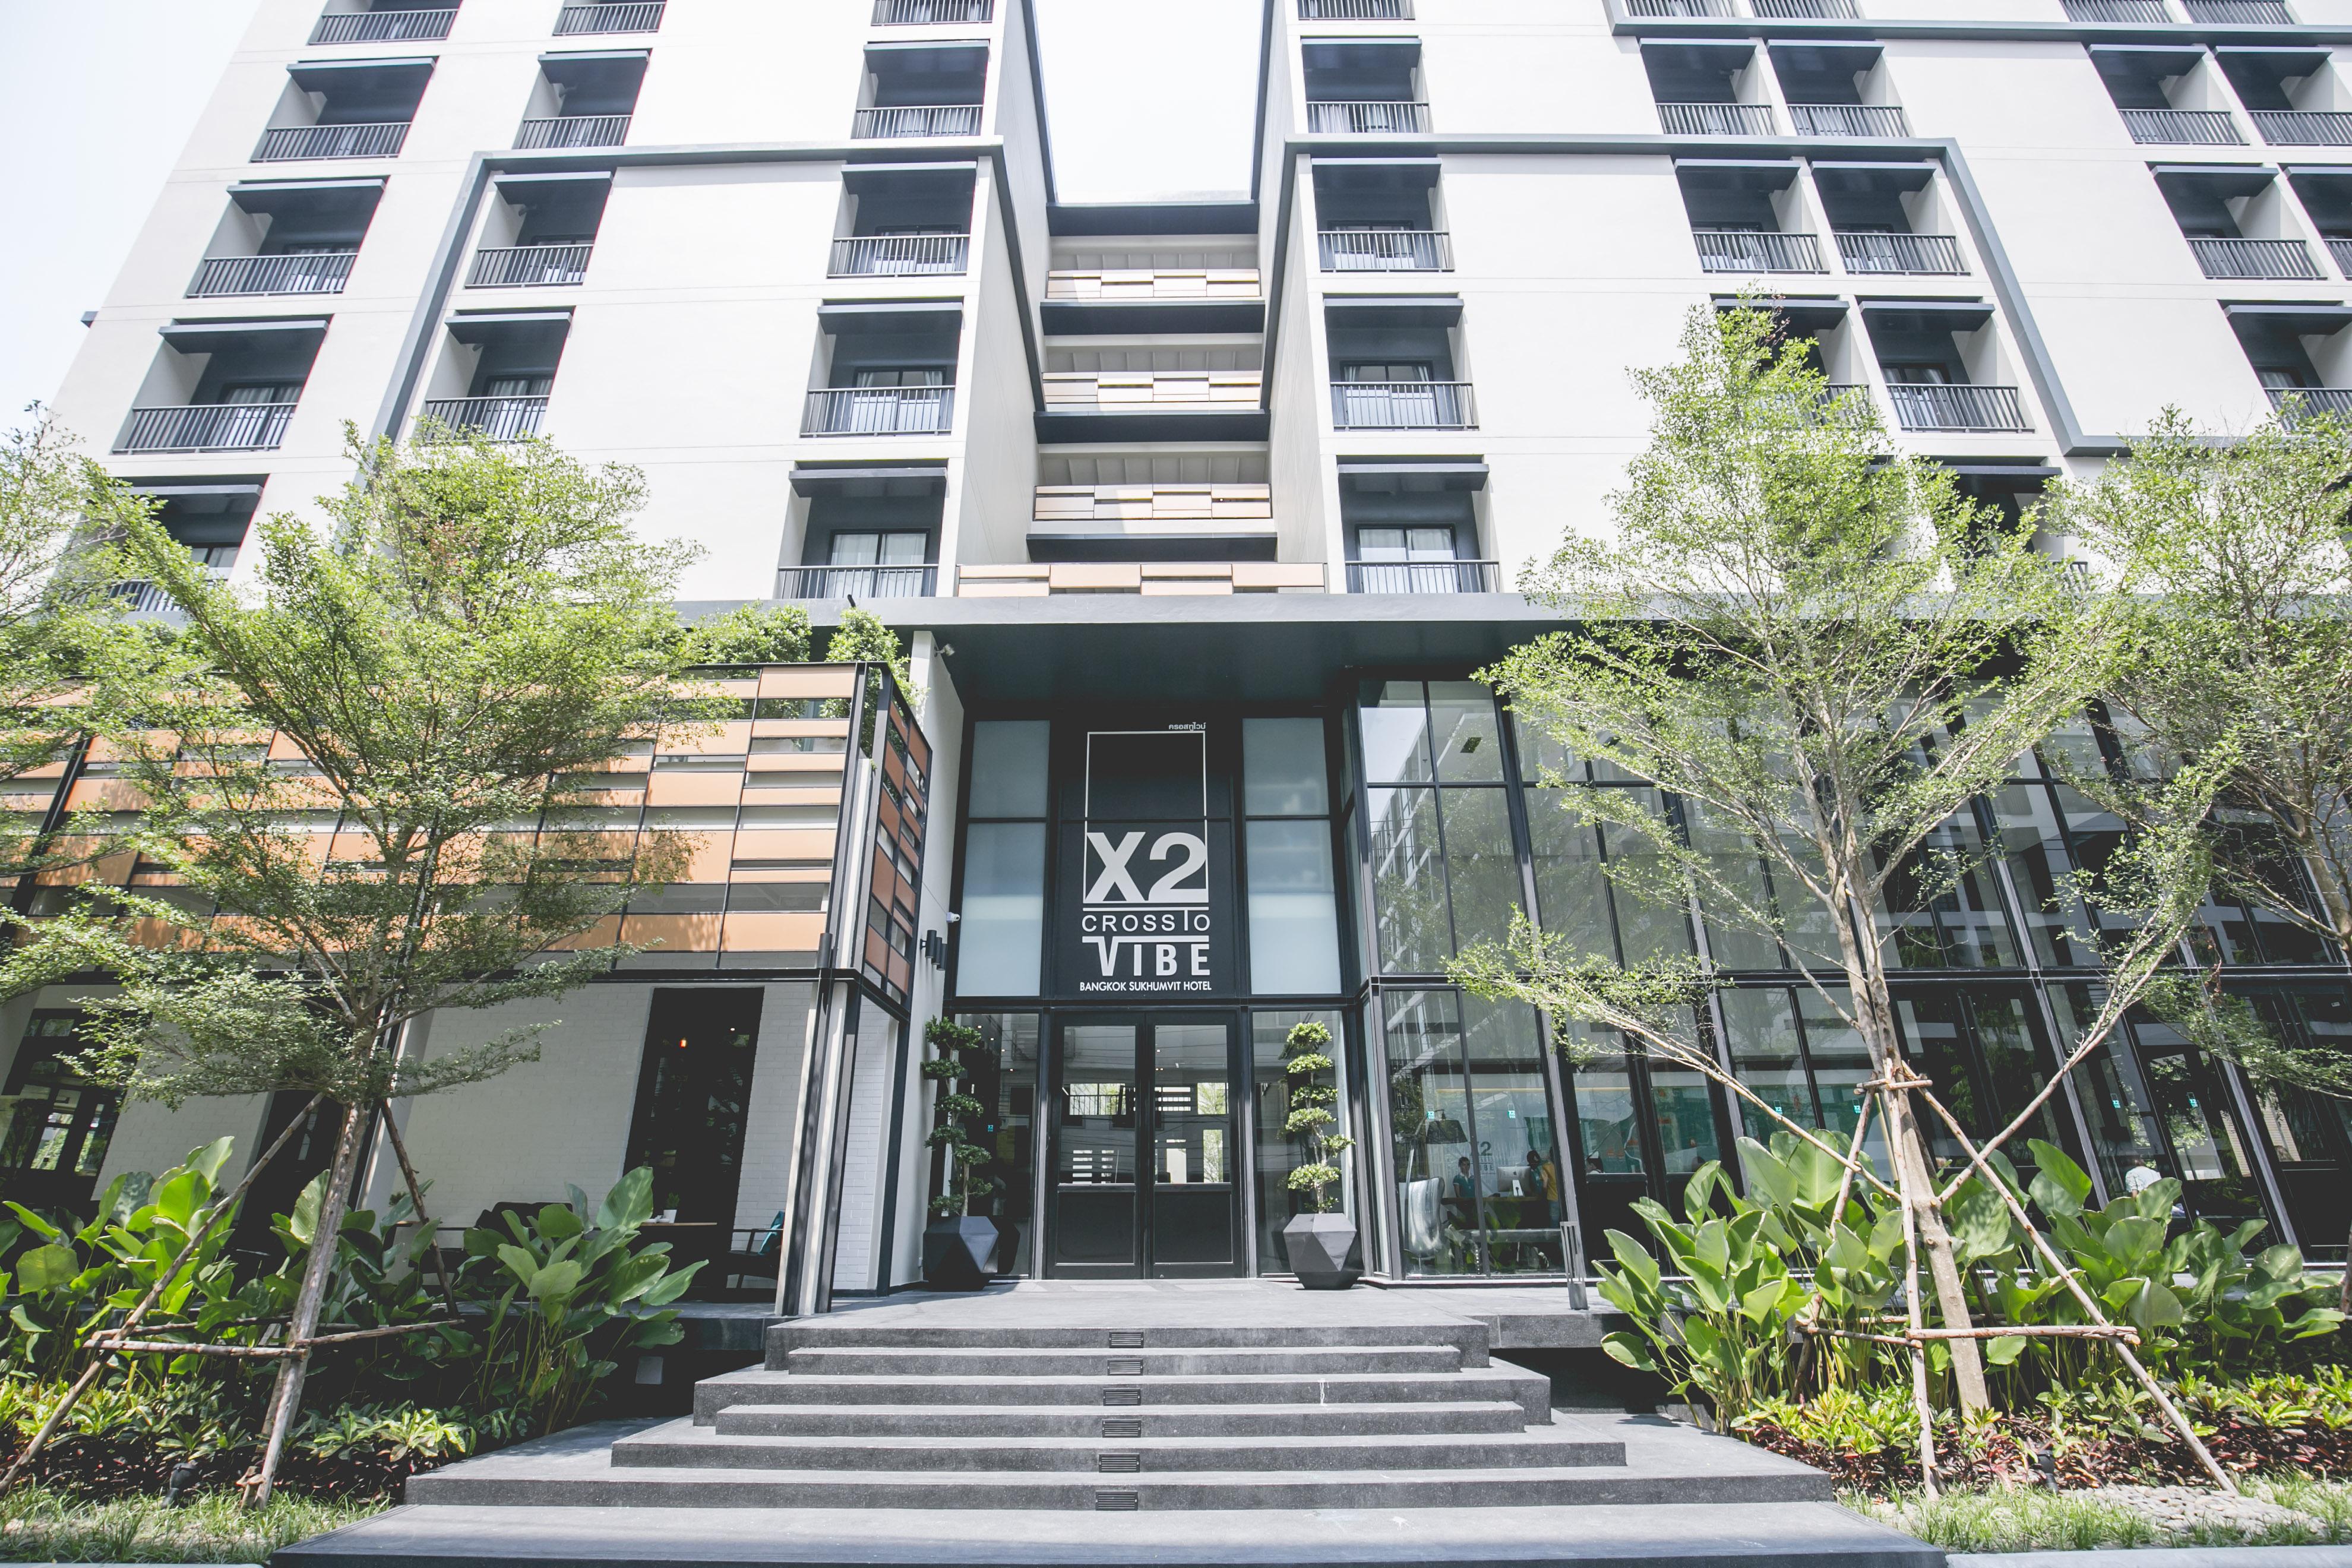 【X2 Vibe Bangkok Sukhumvit】送4G 8日電話數據卡(僅適用於2018年7月10日後之訂單)|曼谷自由行套票3-31天